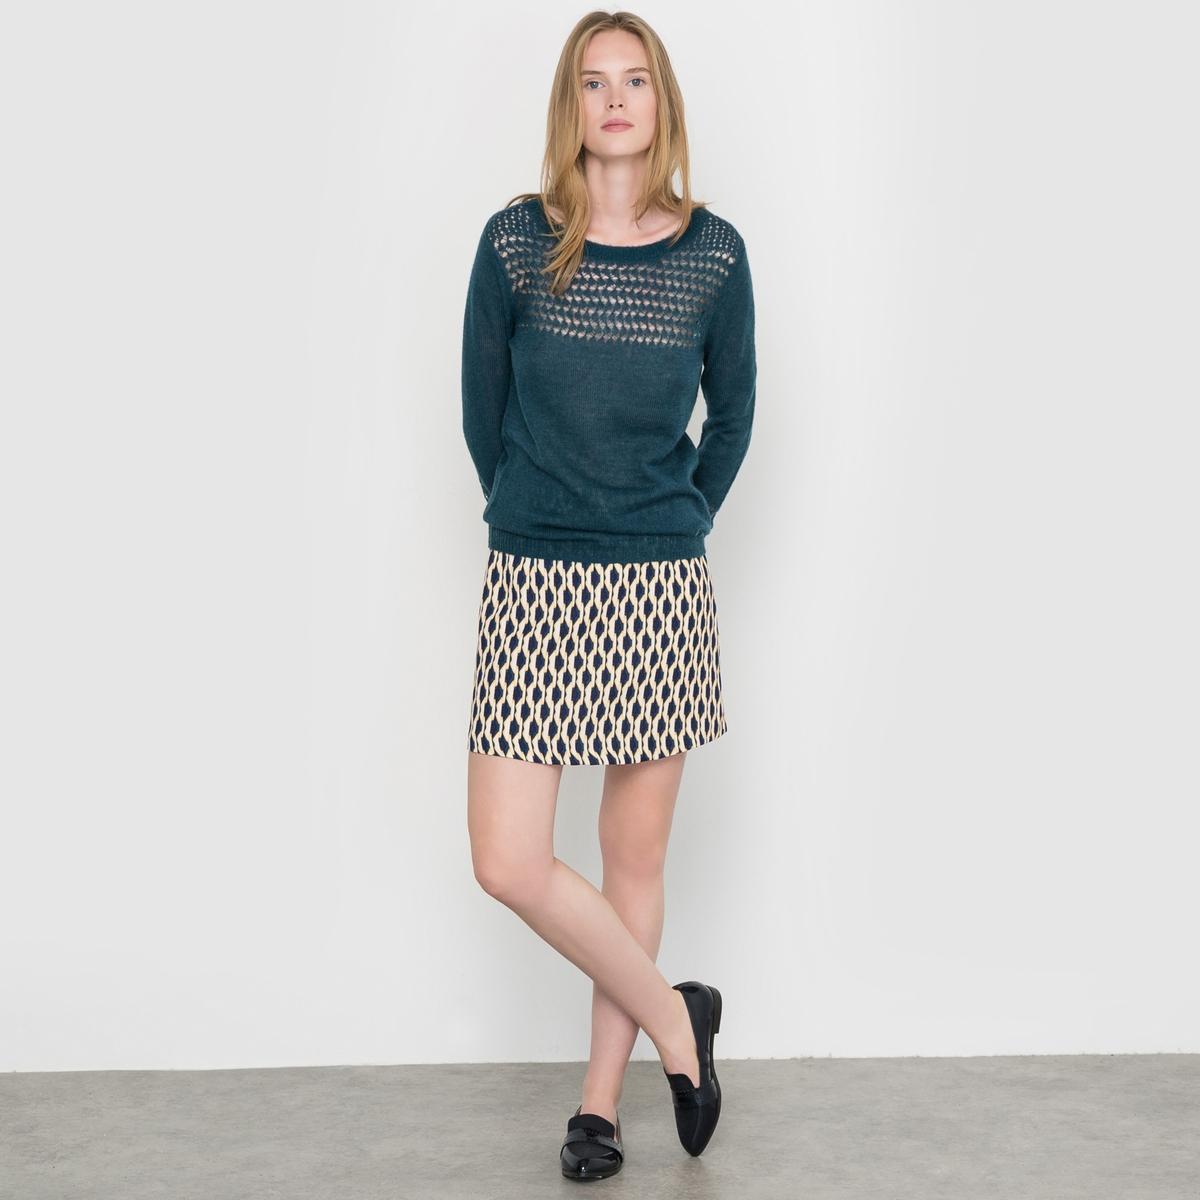 Юбка короткая с рисунком Flore юбка